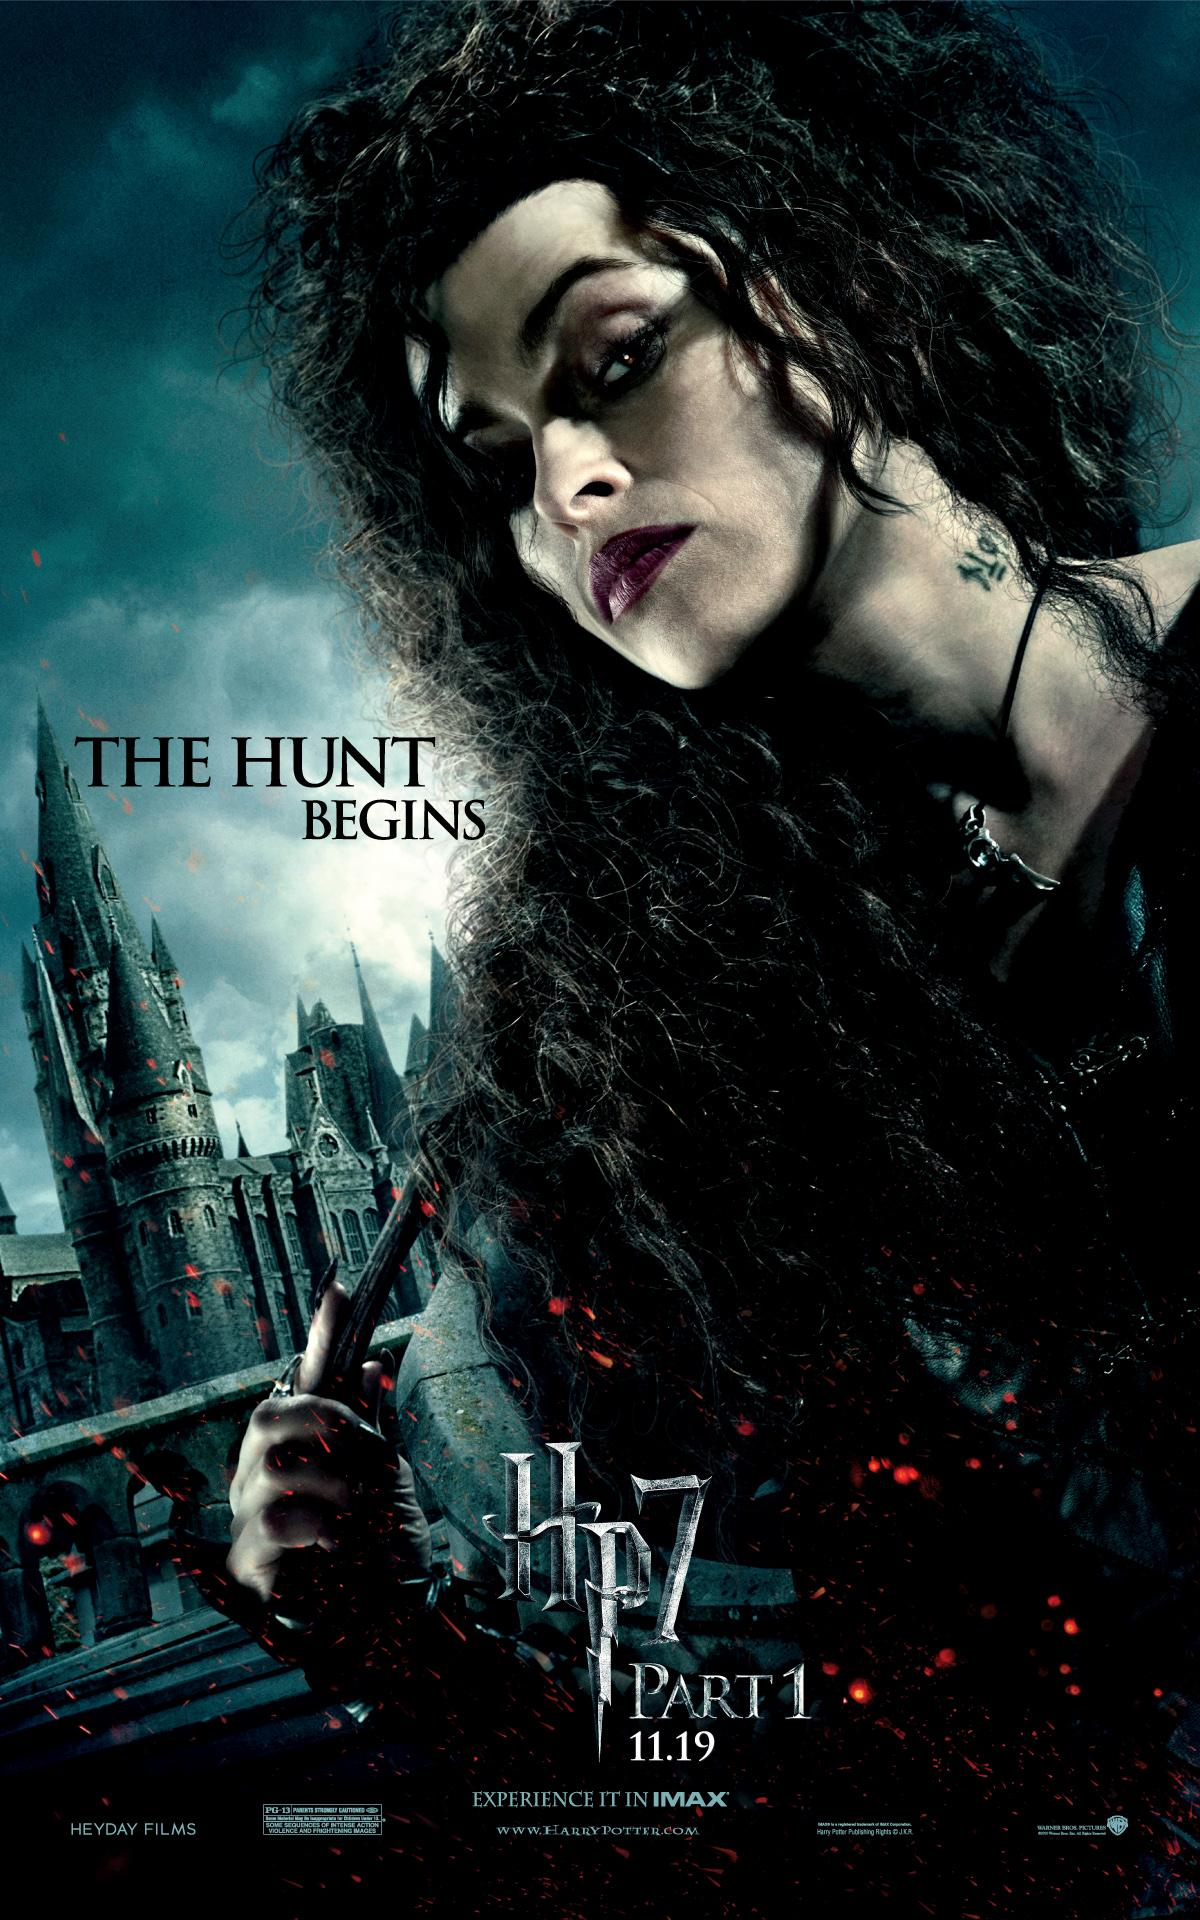 'Deathly Hallows: Part 1' Bellatrix poster